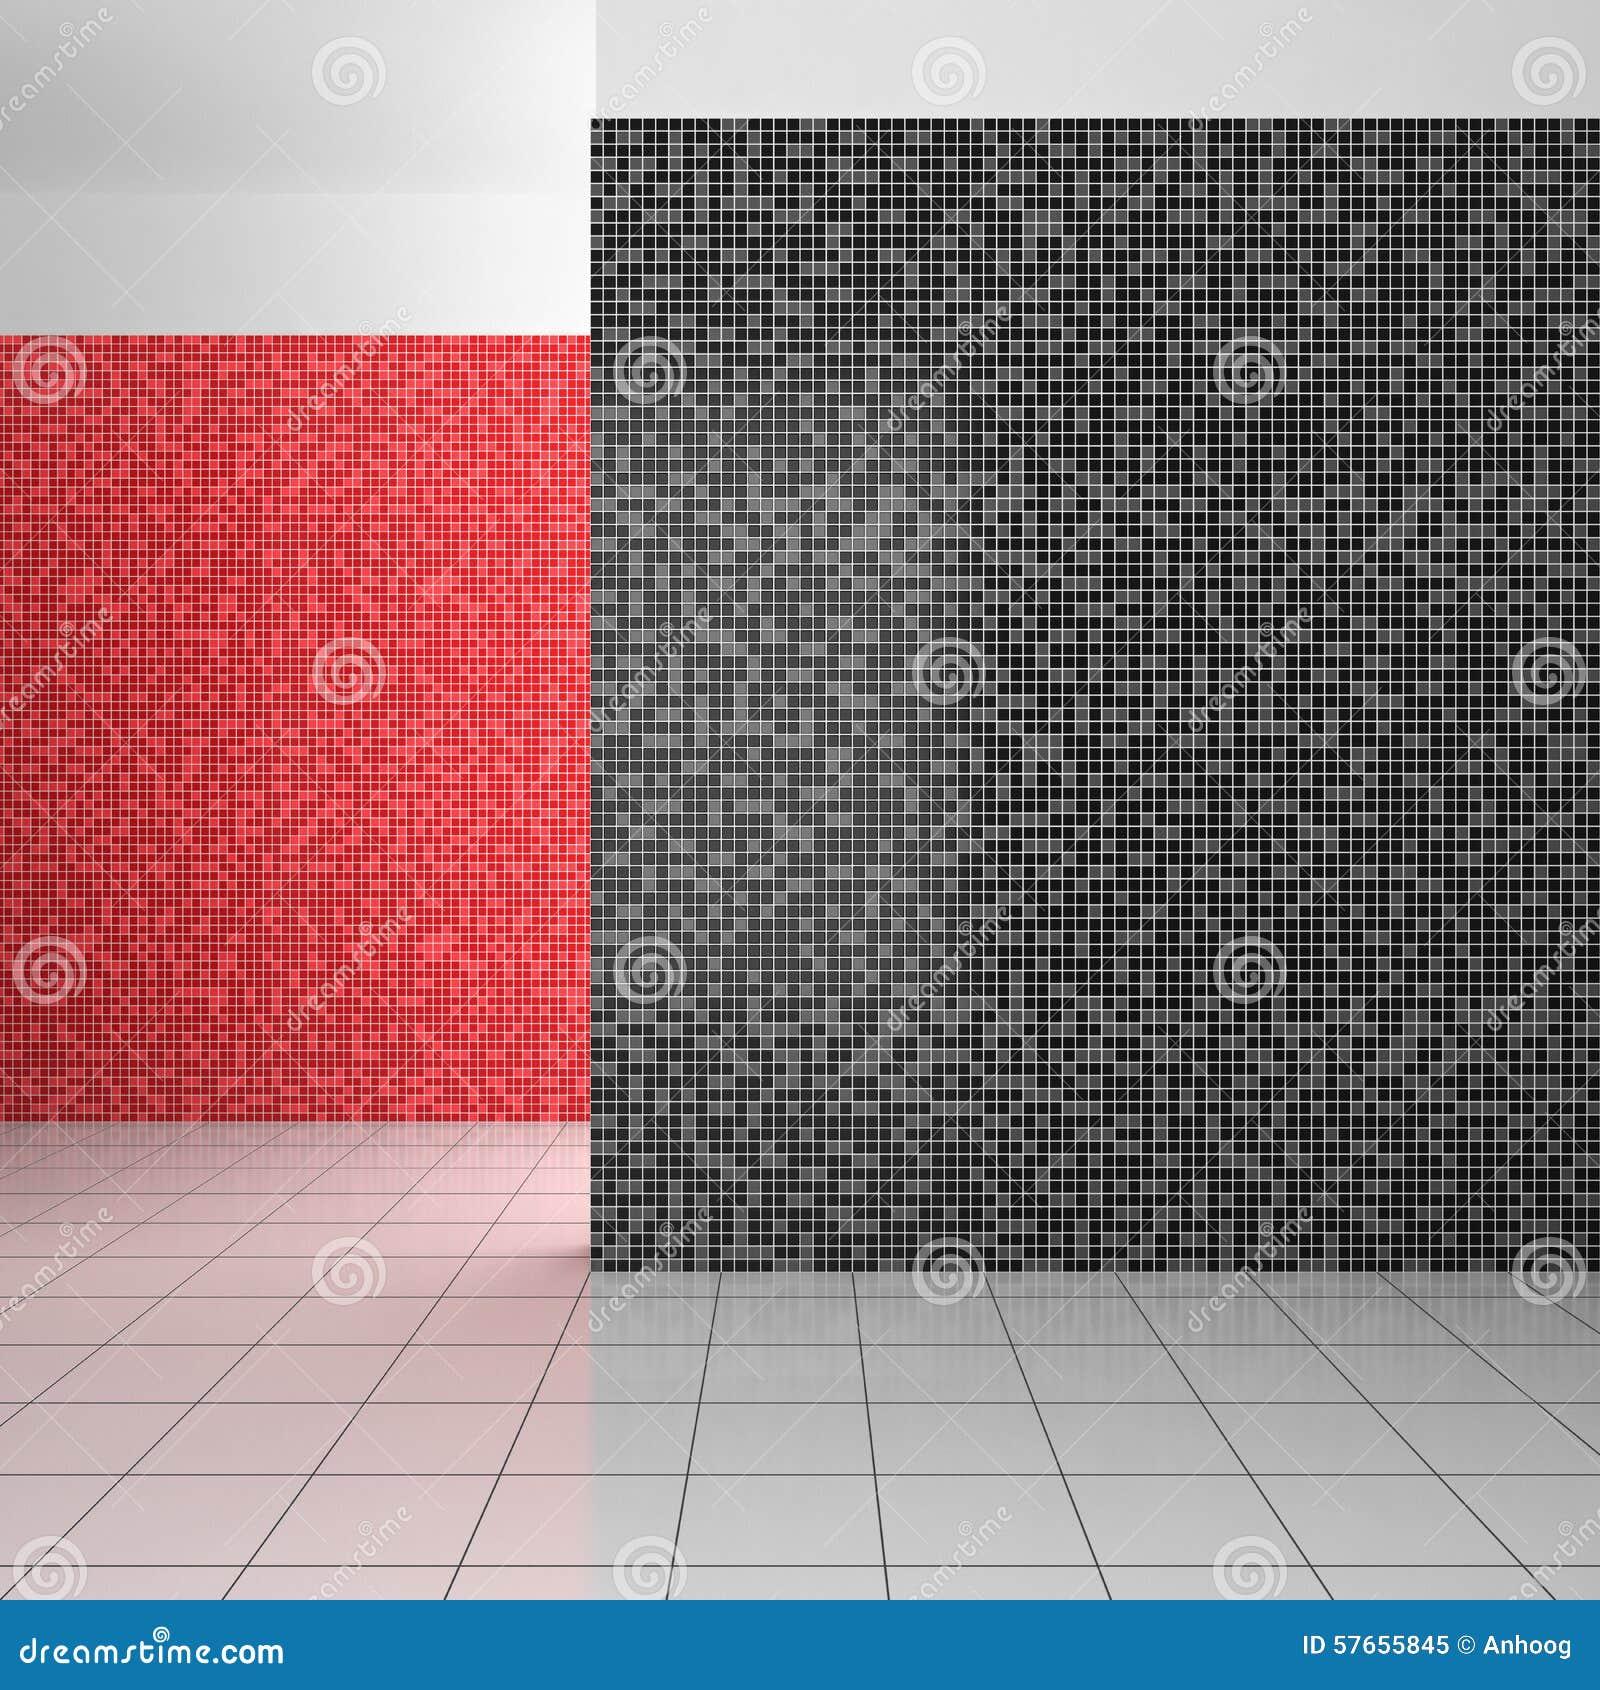 Lege moderne badkamers met zwarte, witte en rode tegels